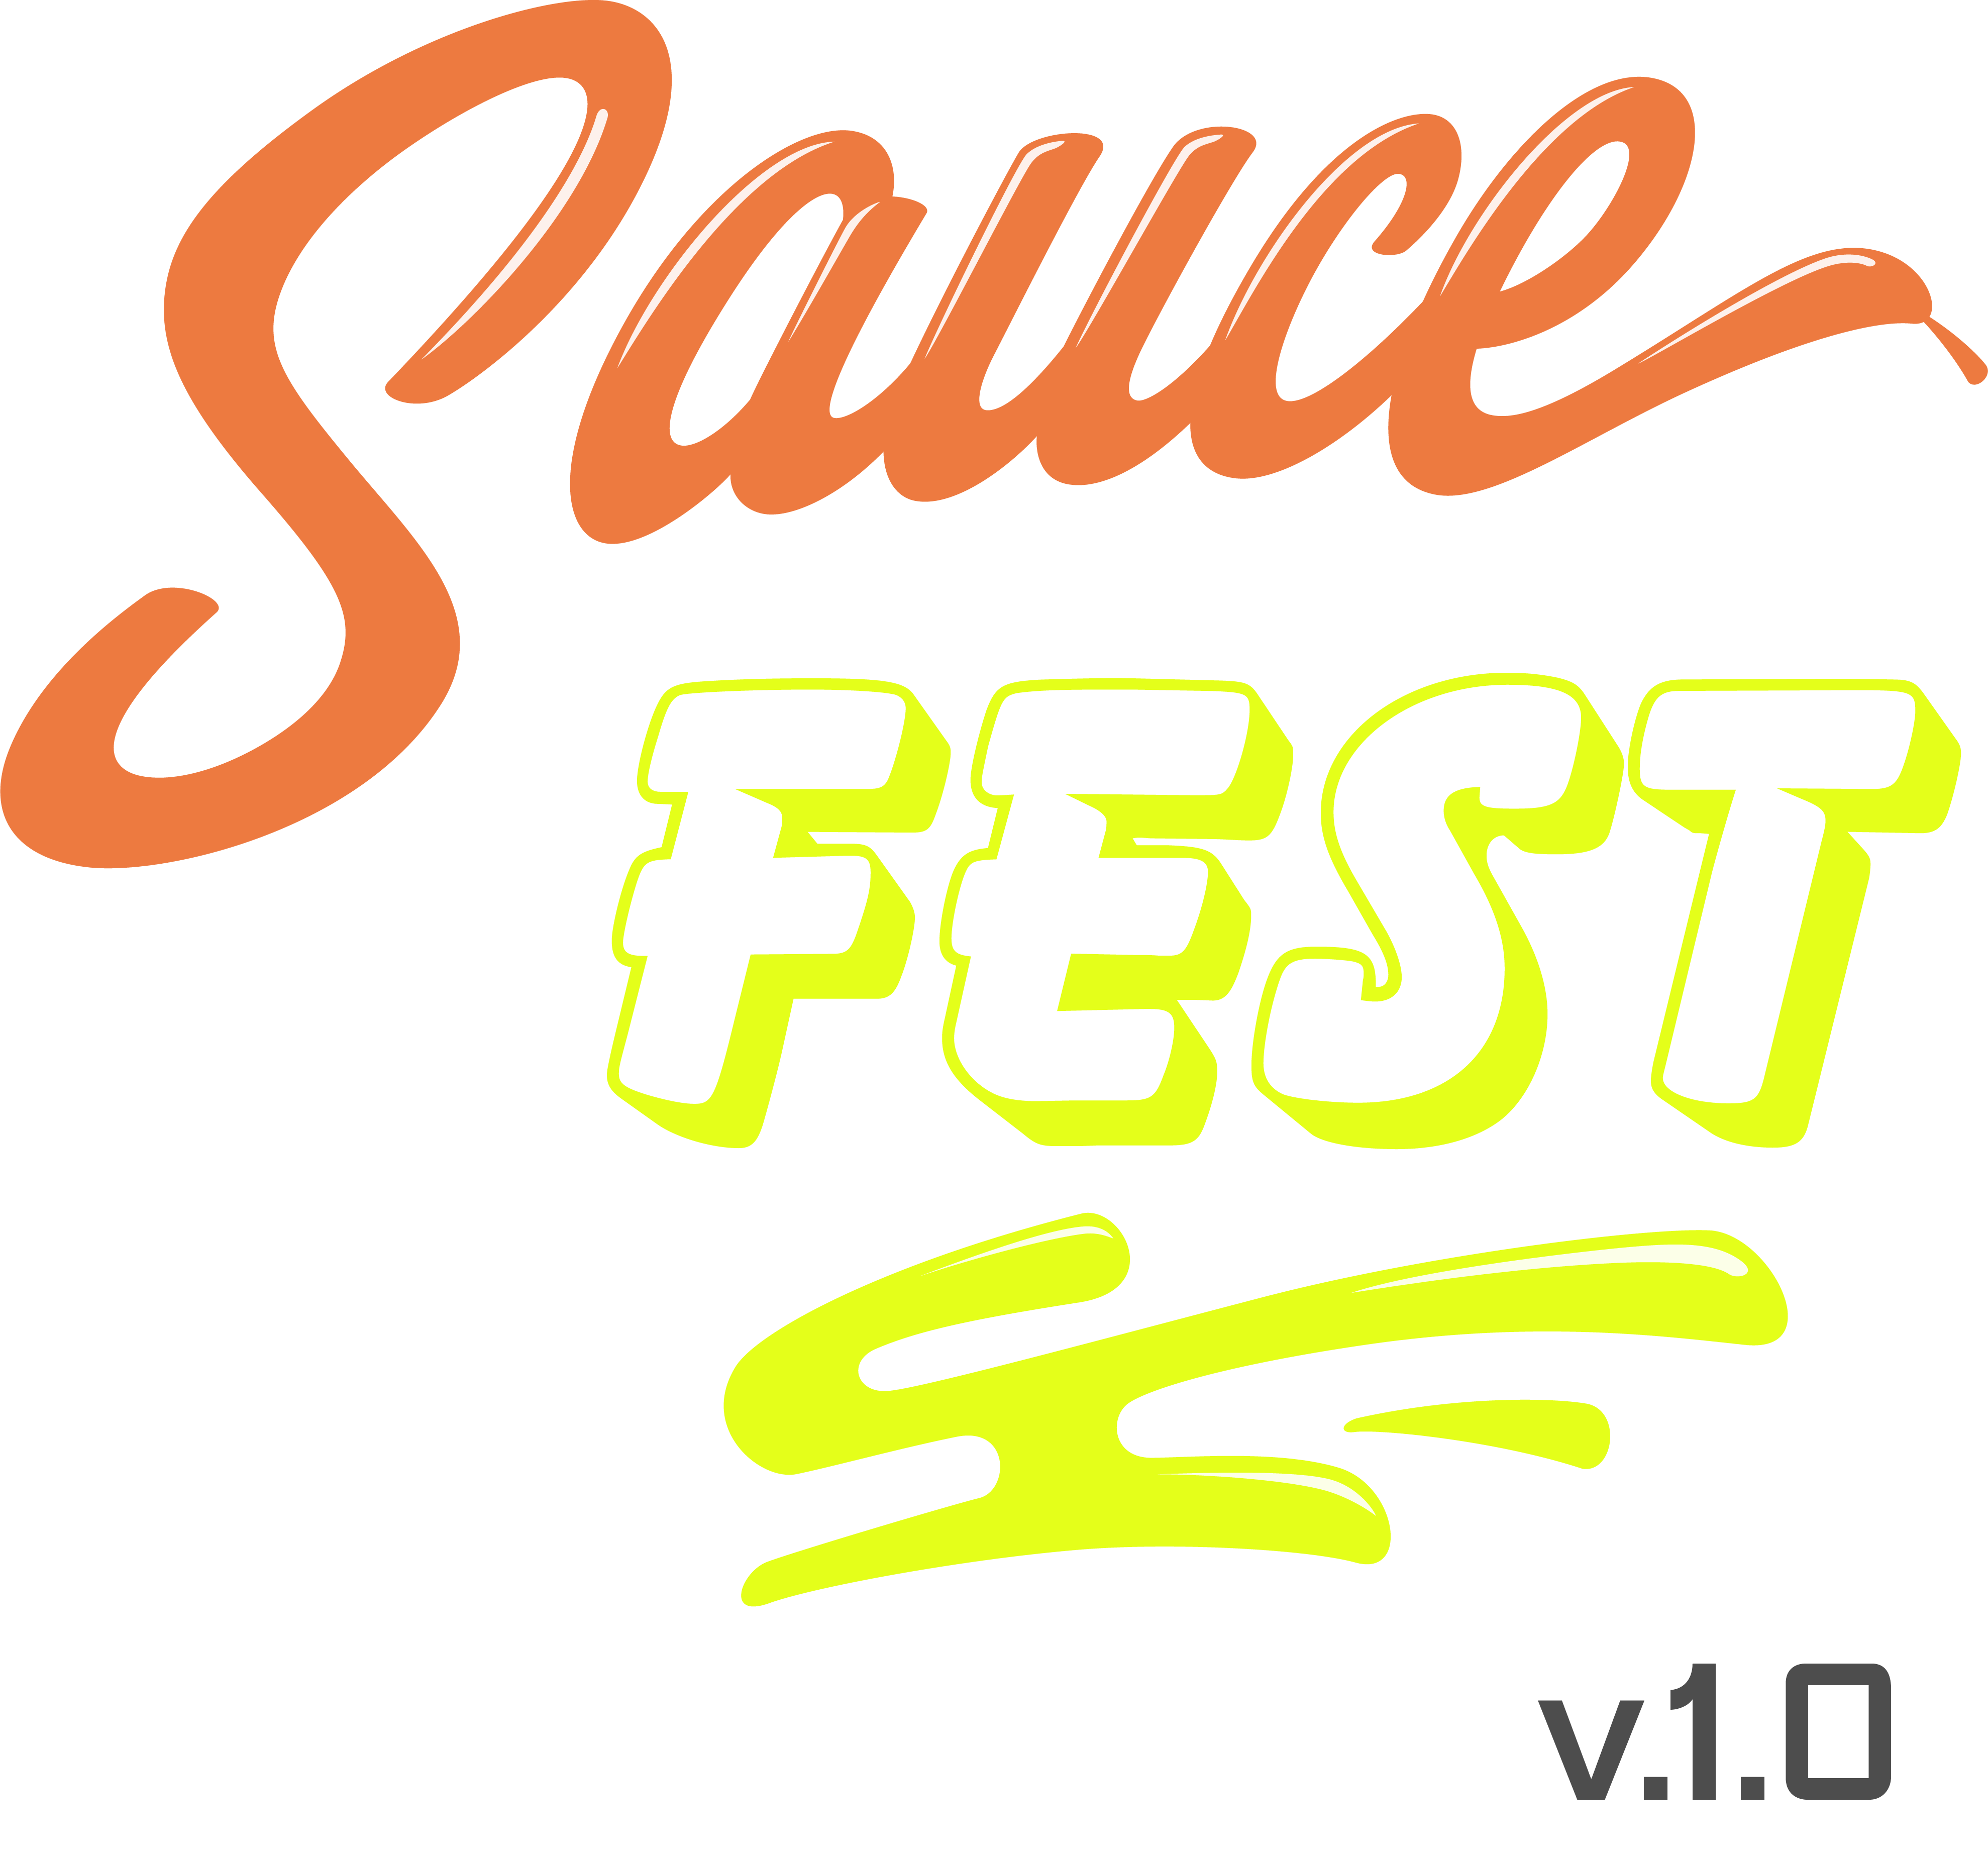 centralsauce sauce fest